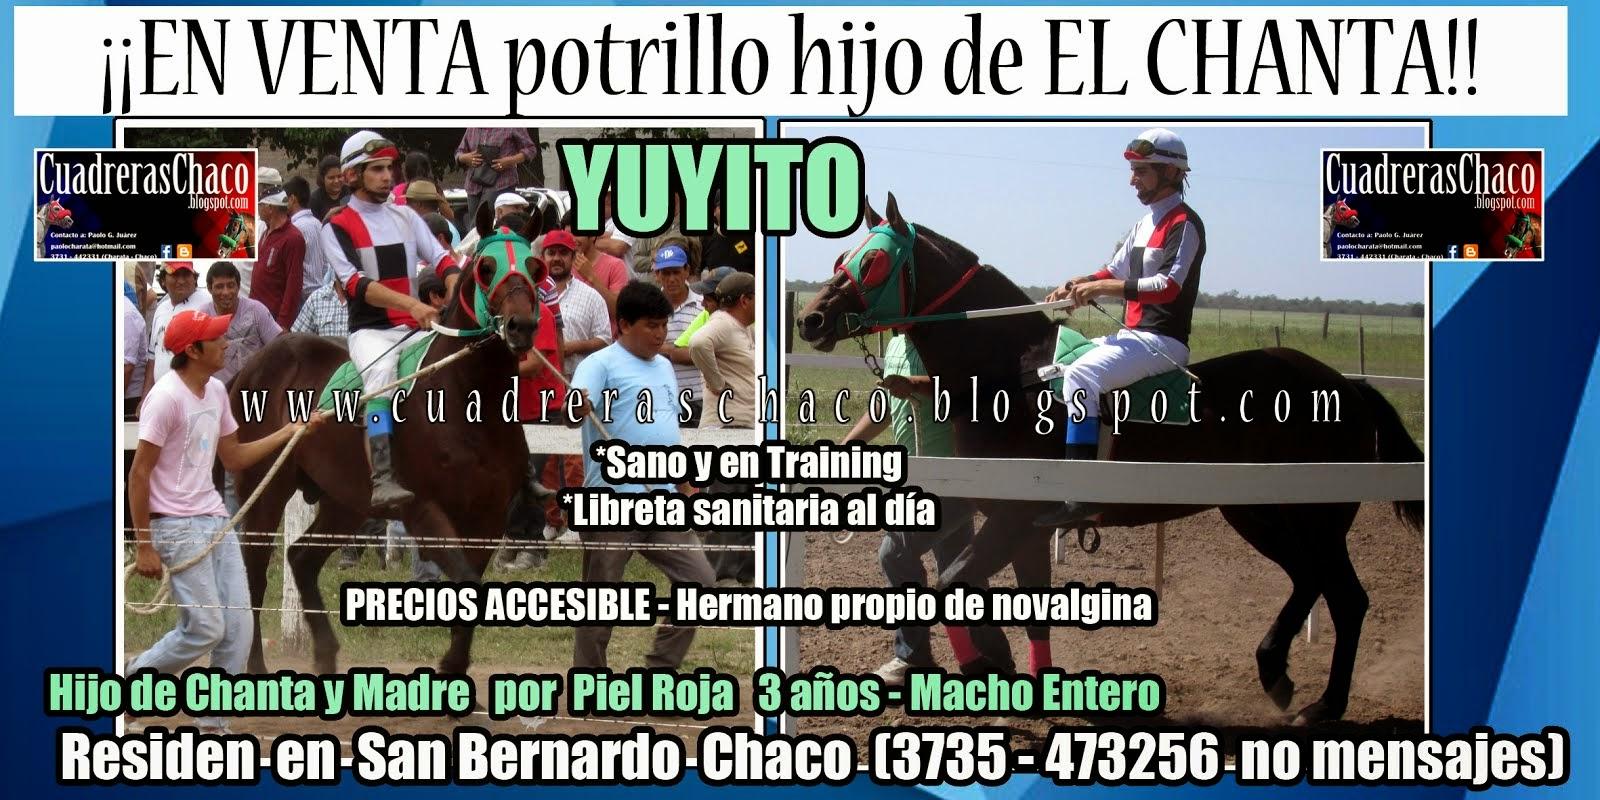 VENTA YUYITO 14-11-14